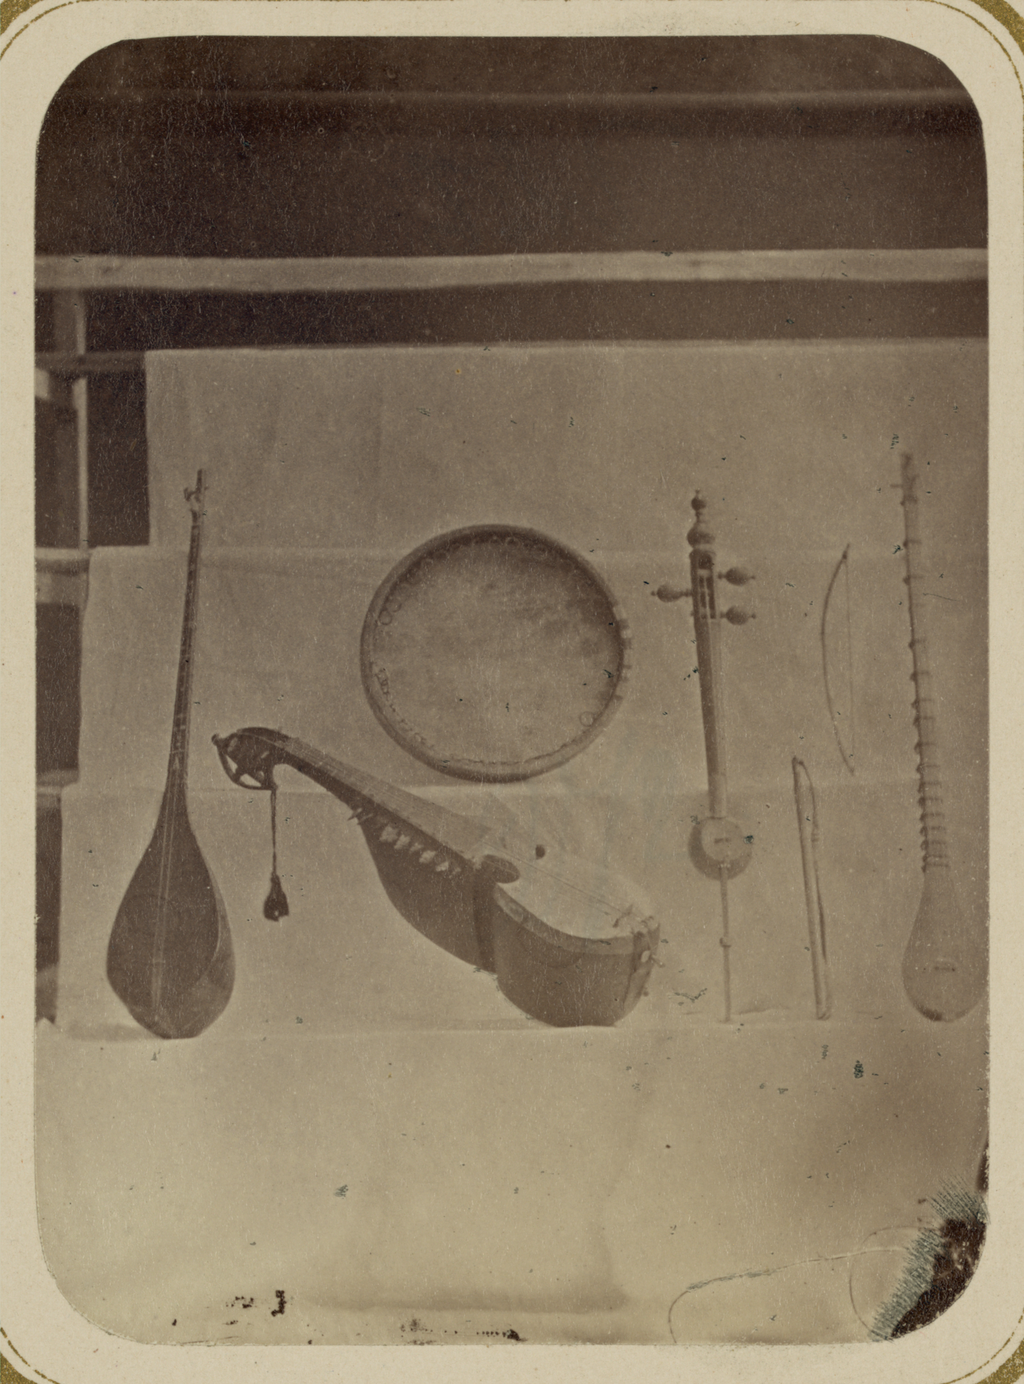 Музыкальные инструменты и музыканты. Струнные инструменты и тамбурин